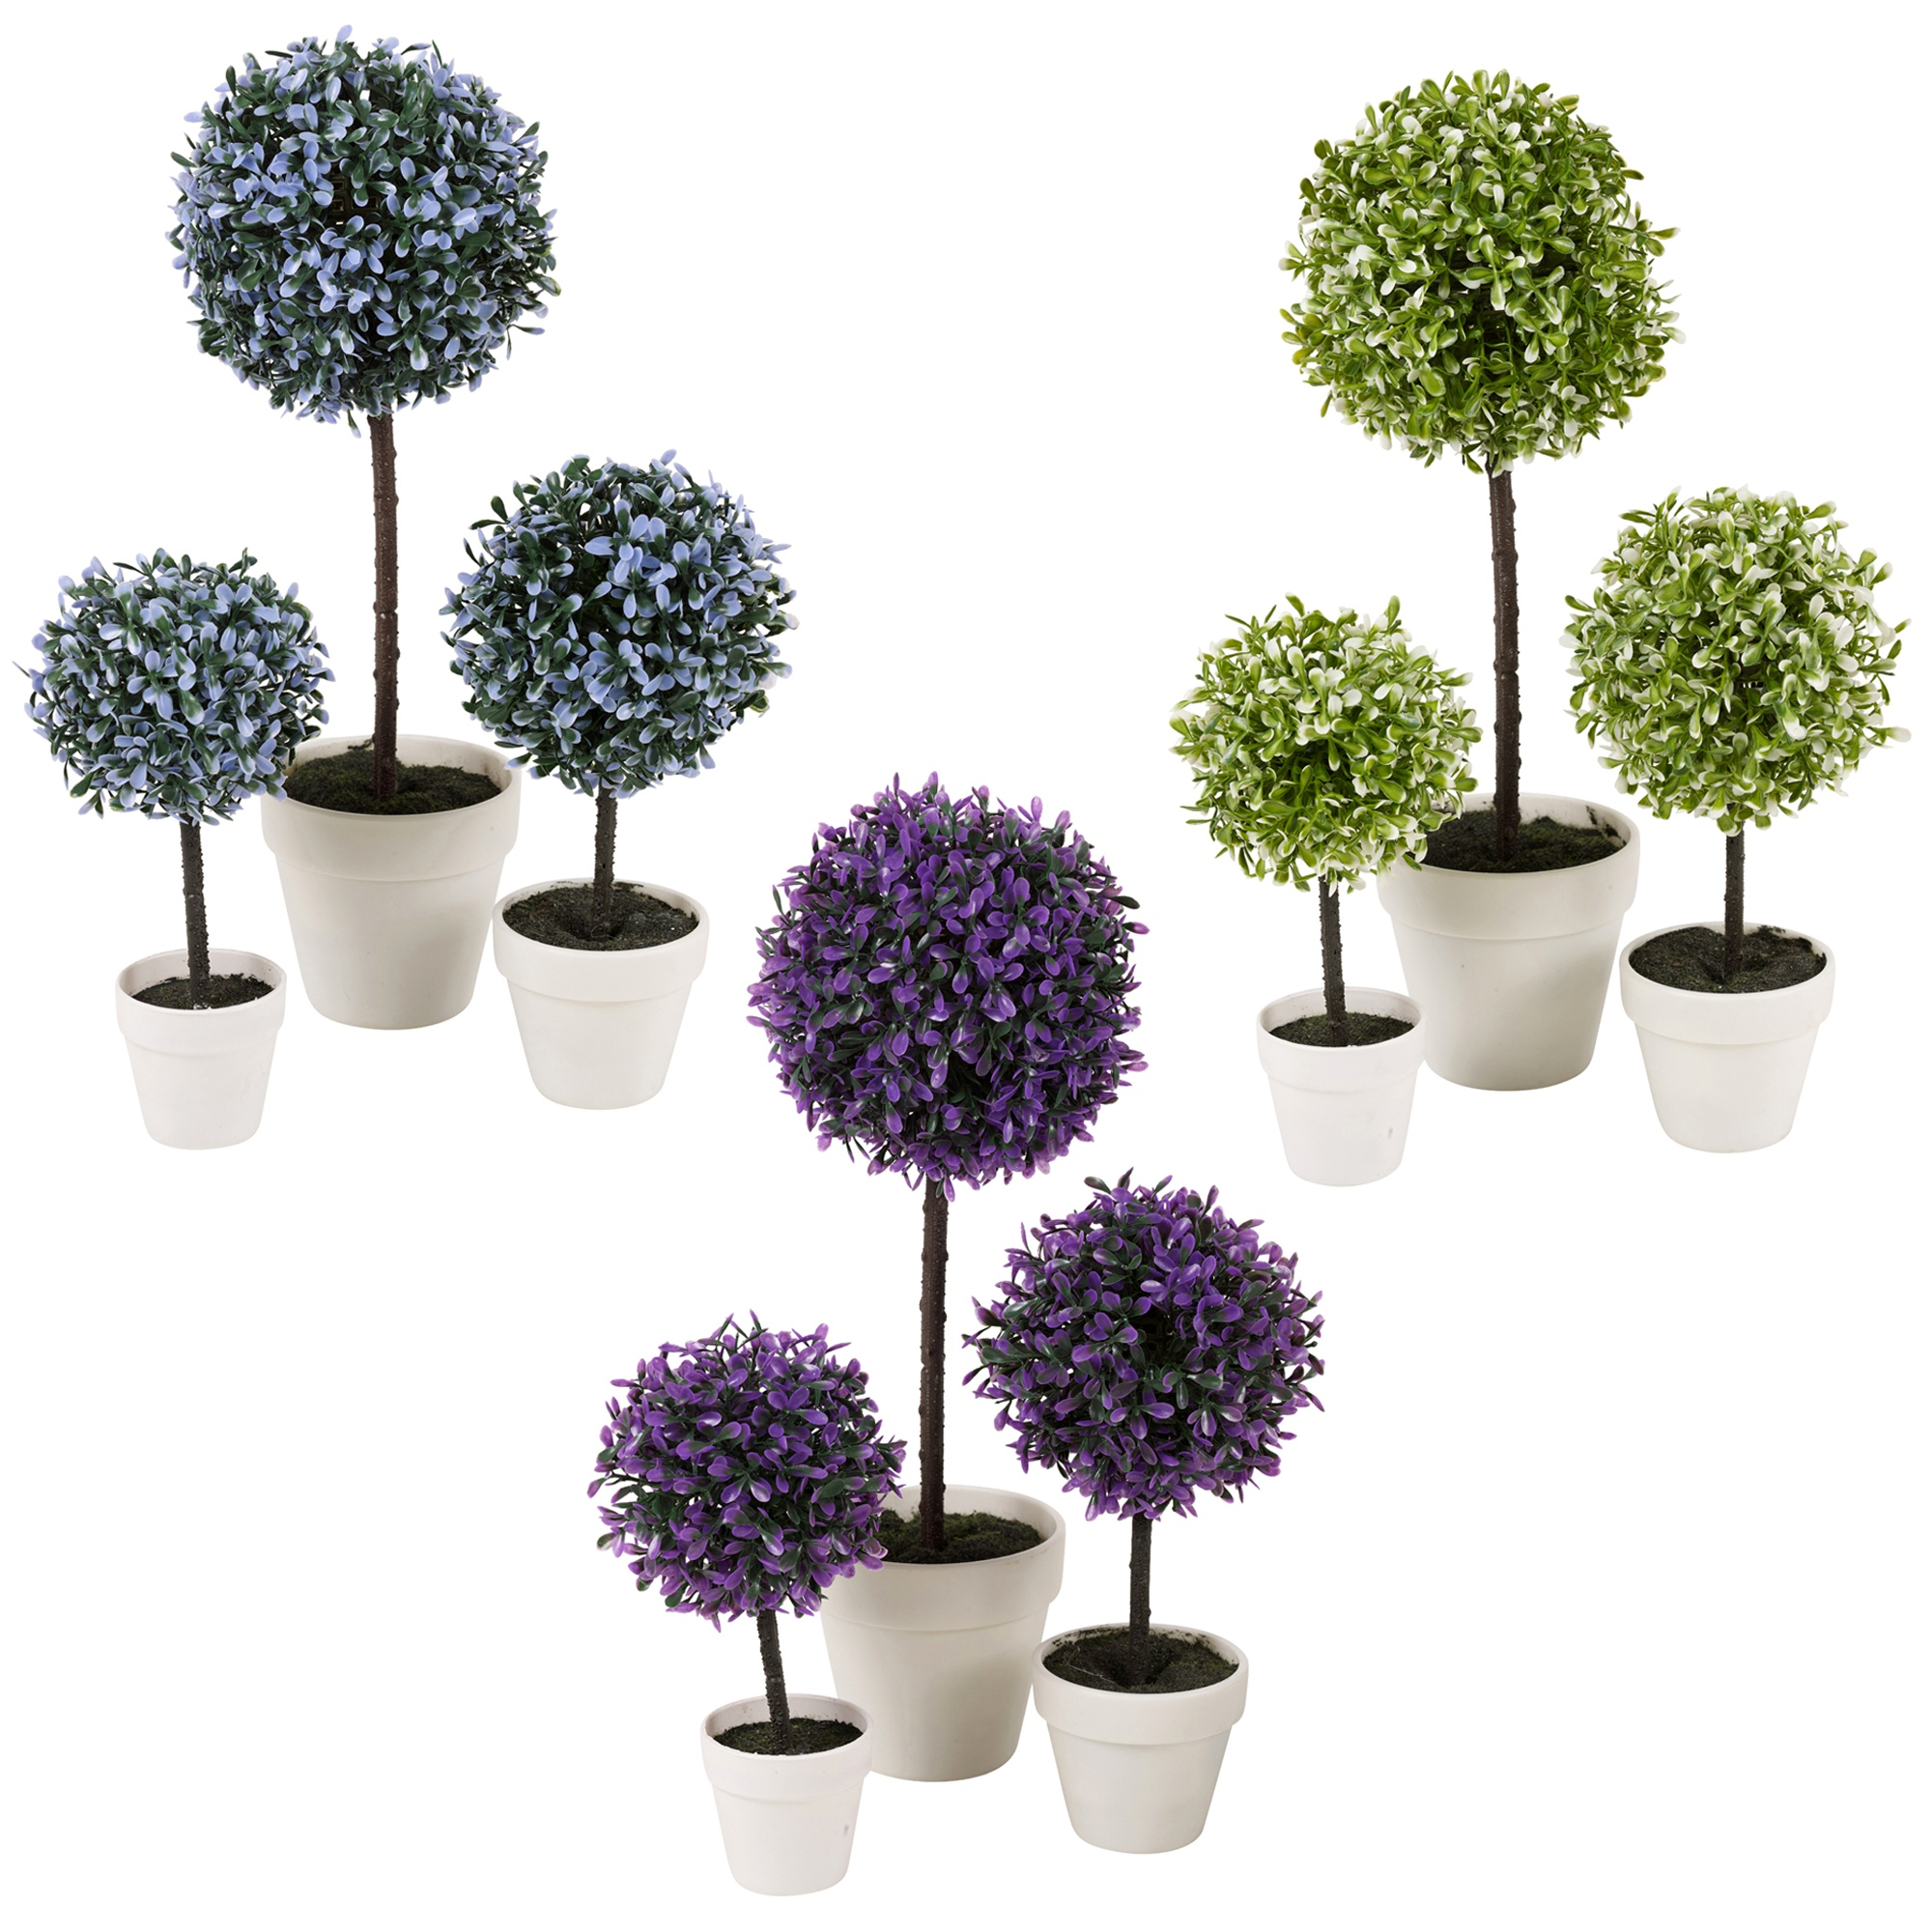 Decorative Artificial Outdoor Ball Plant Tree Pot Colour